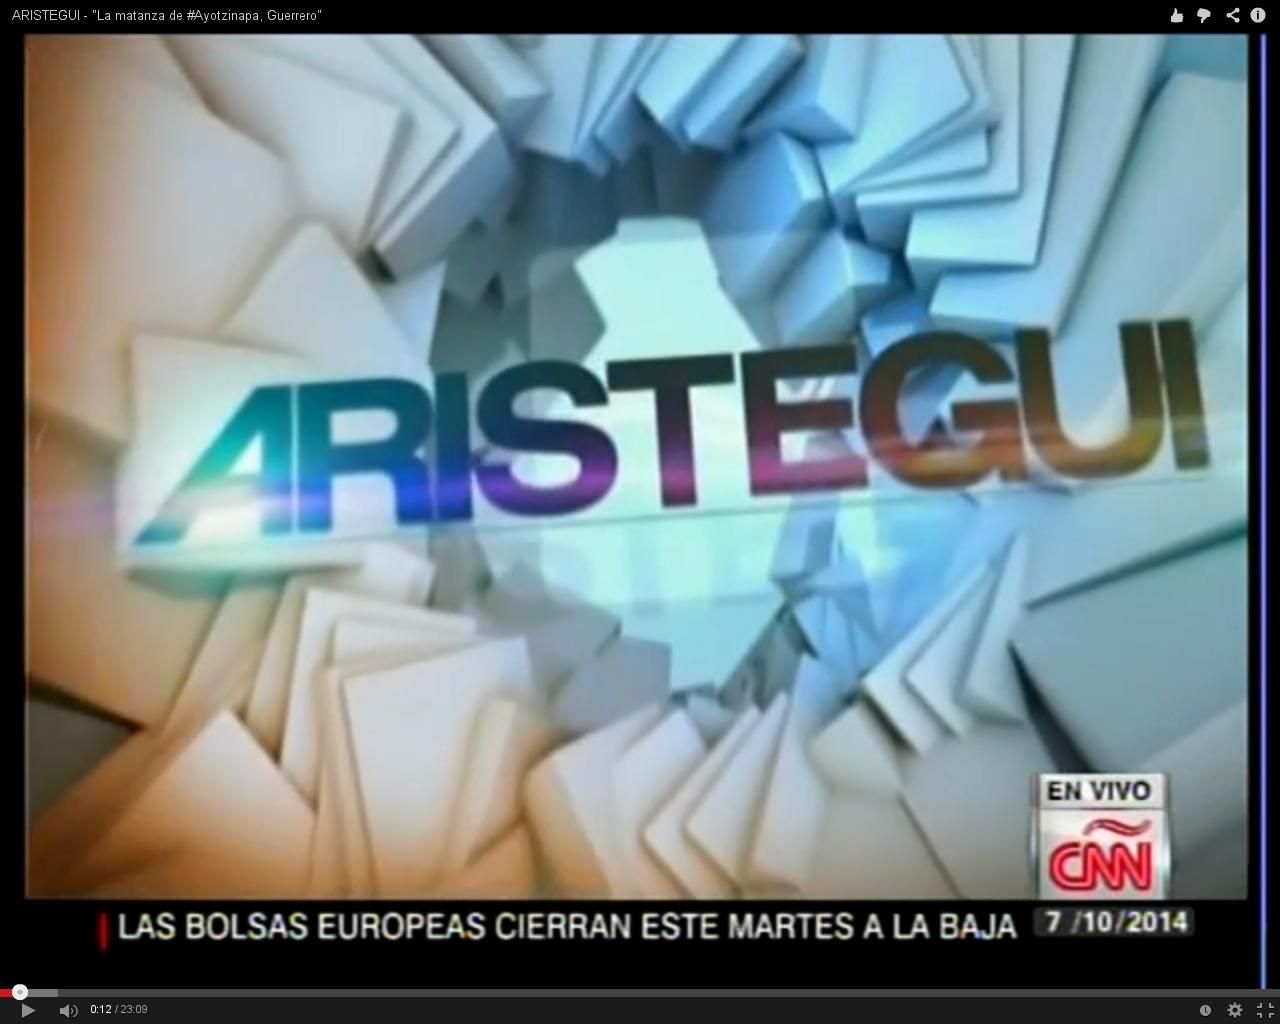 Aristegui Cnn Ayotzinapa